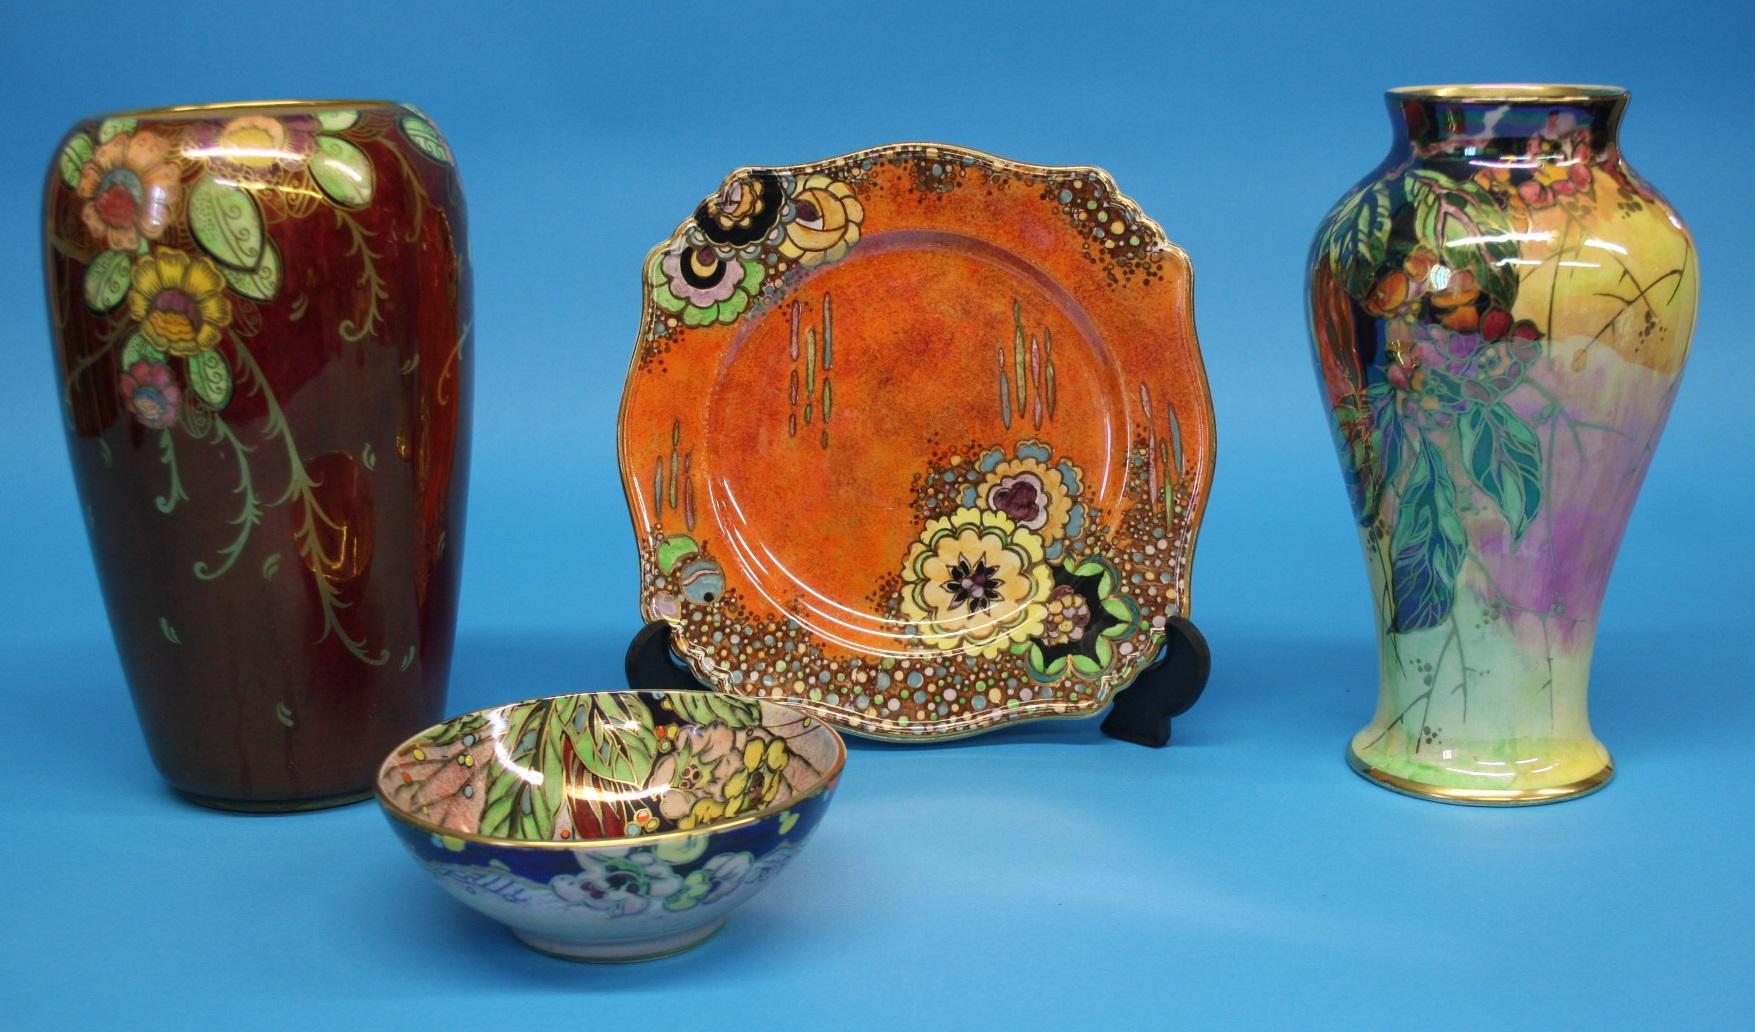 A royal winton grimwades plate a shallow circular bowl and two lot 15 a royal winton grimwades plate a shallow circular bowl and two royal reviewsmspy